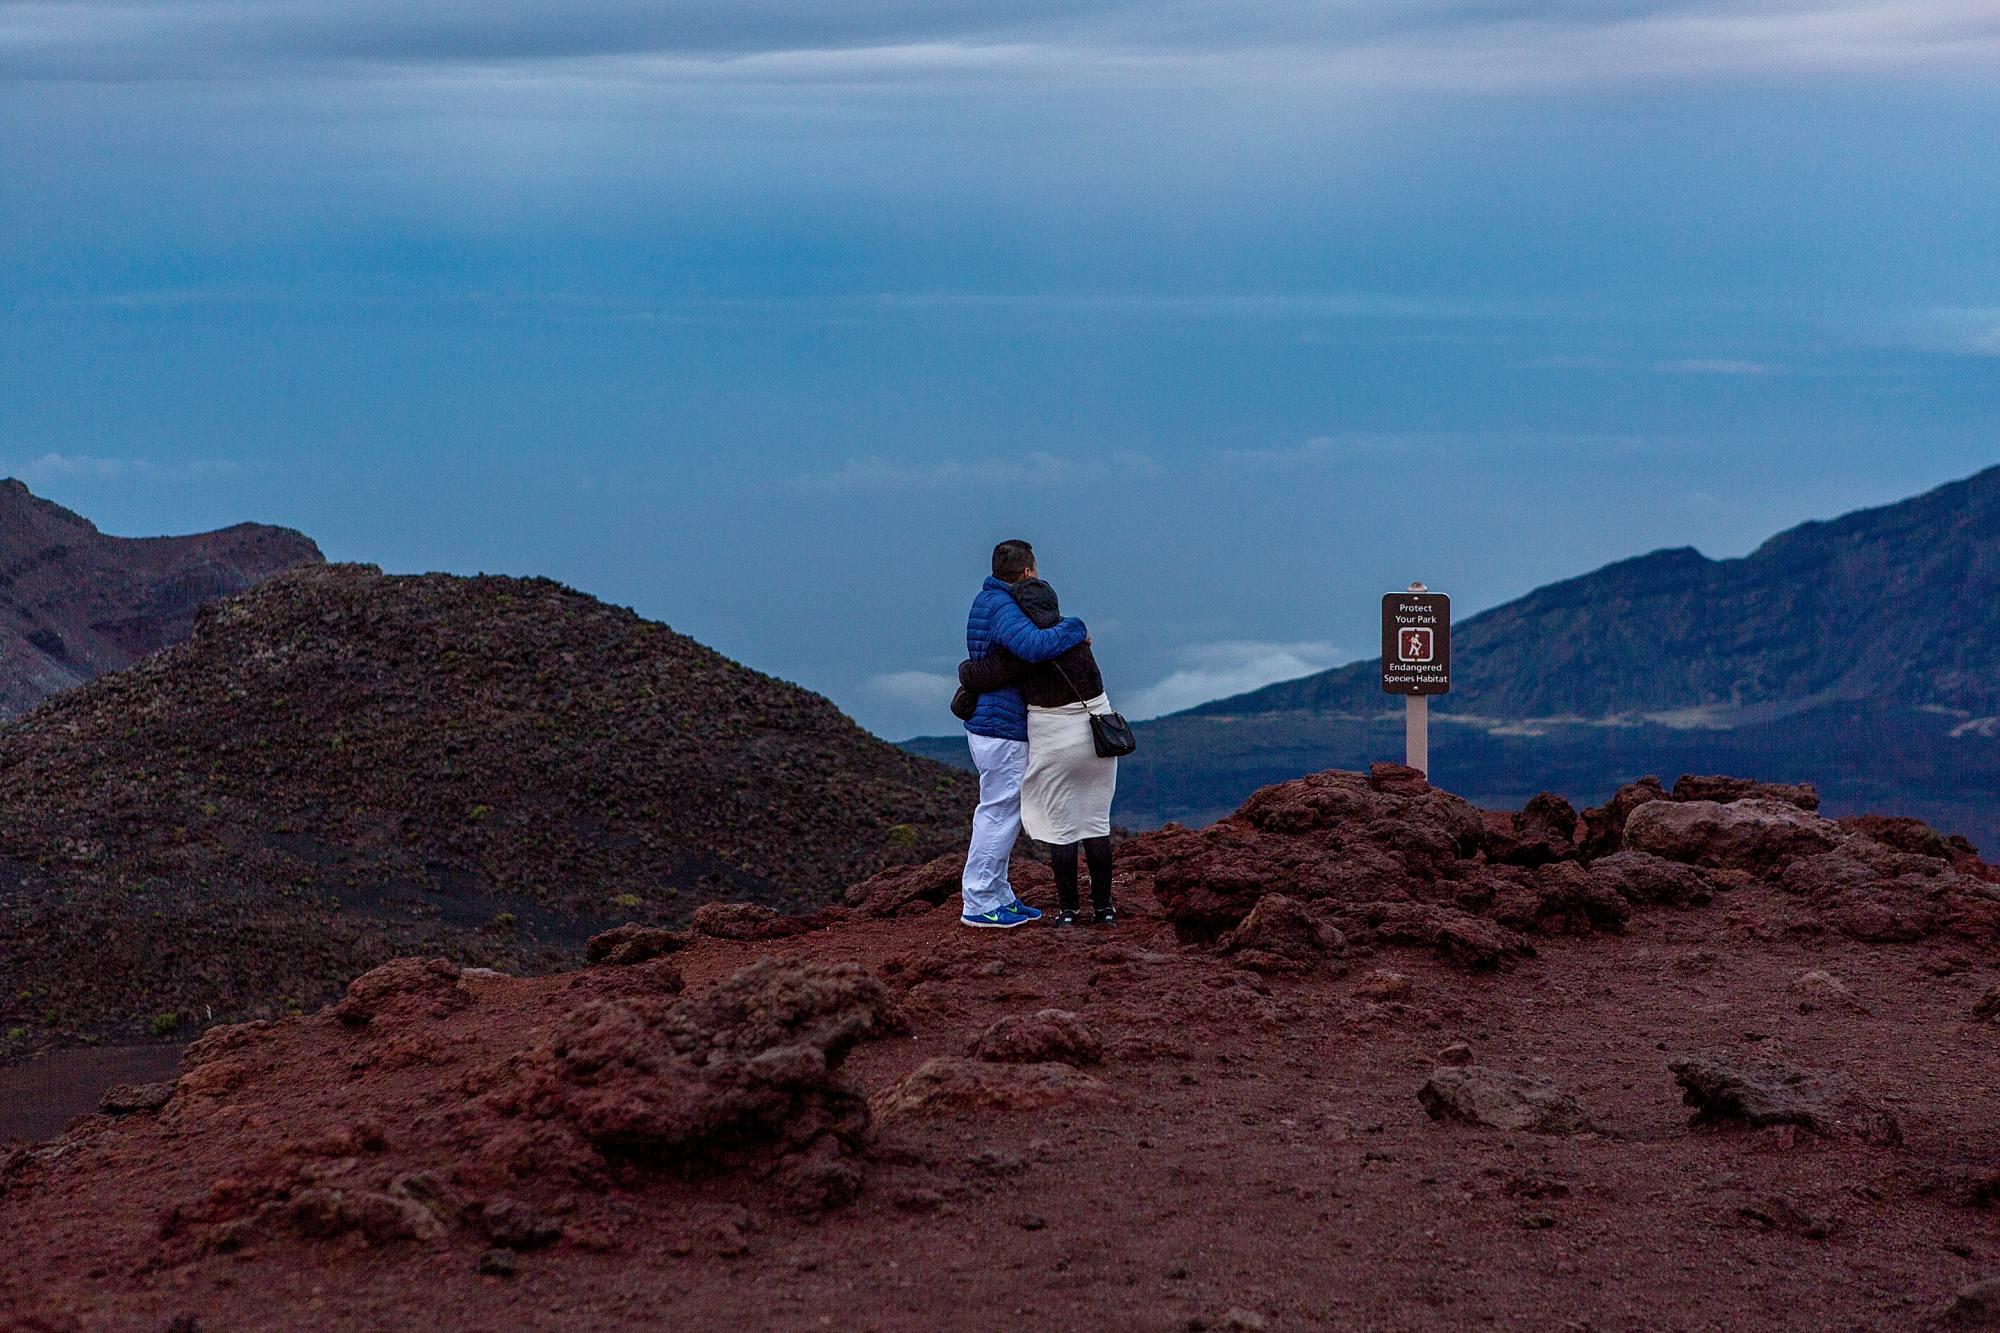 couple hugging on mountain